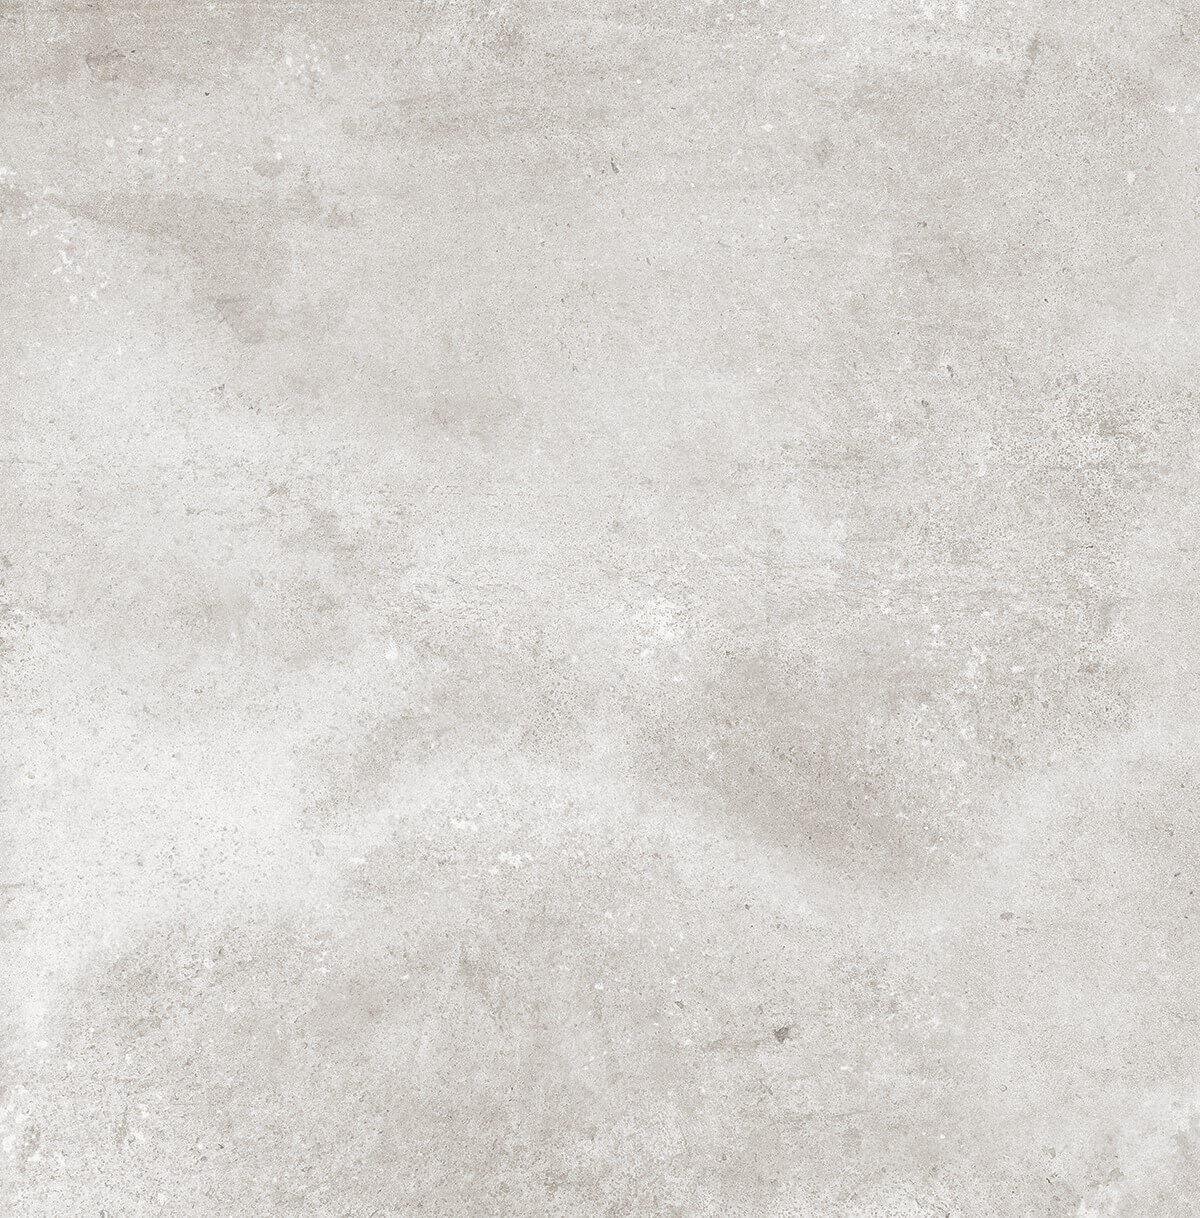 Luxor Grey Honed Concrete Look Rectified Porcelain Tile 3496